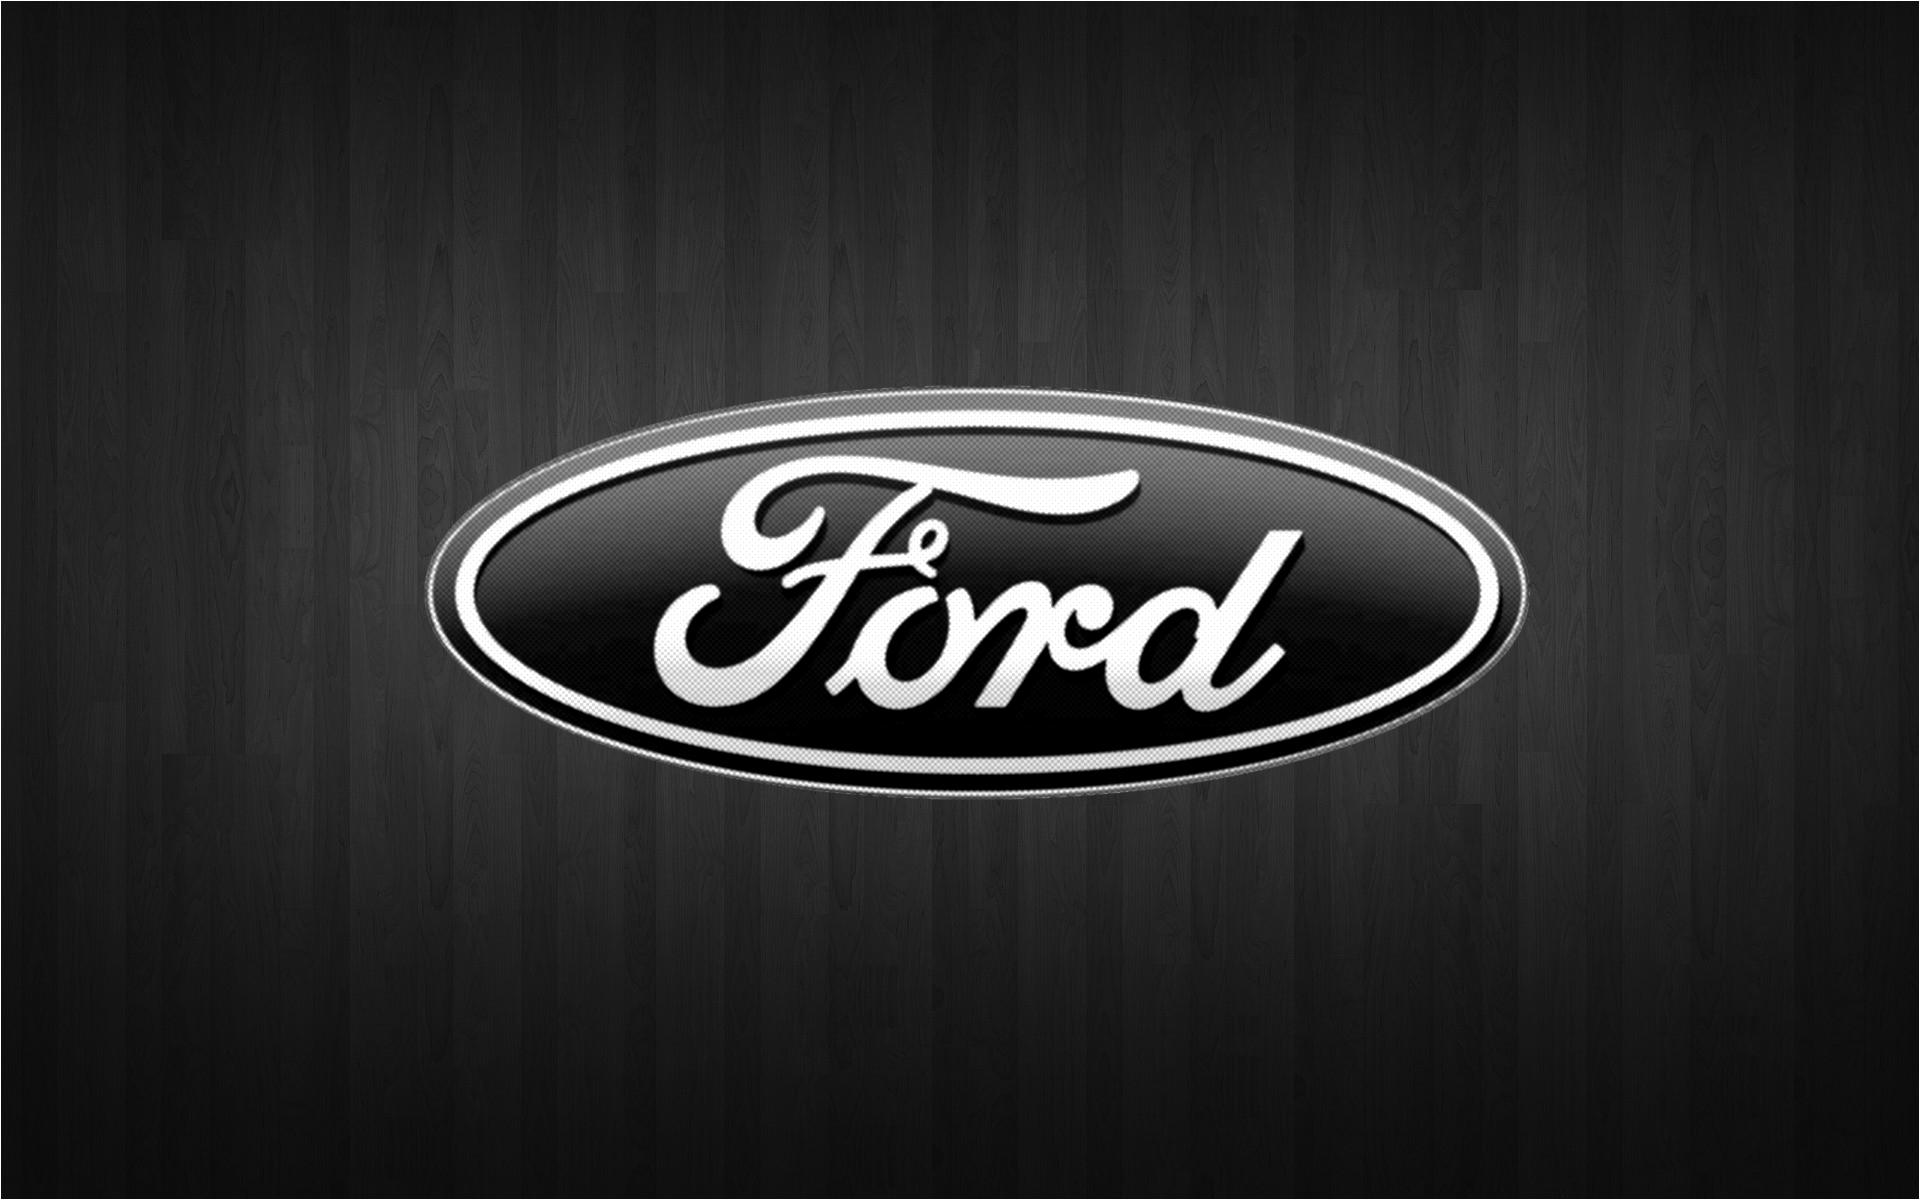 free ford logo coil wiring diagram wallpapers pixelstalk net